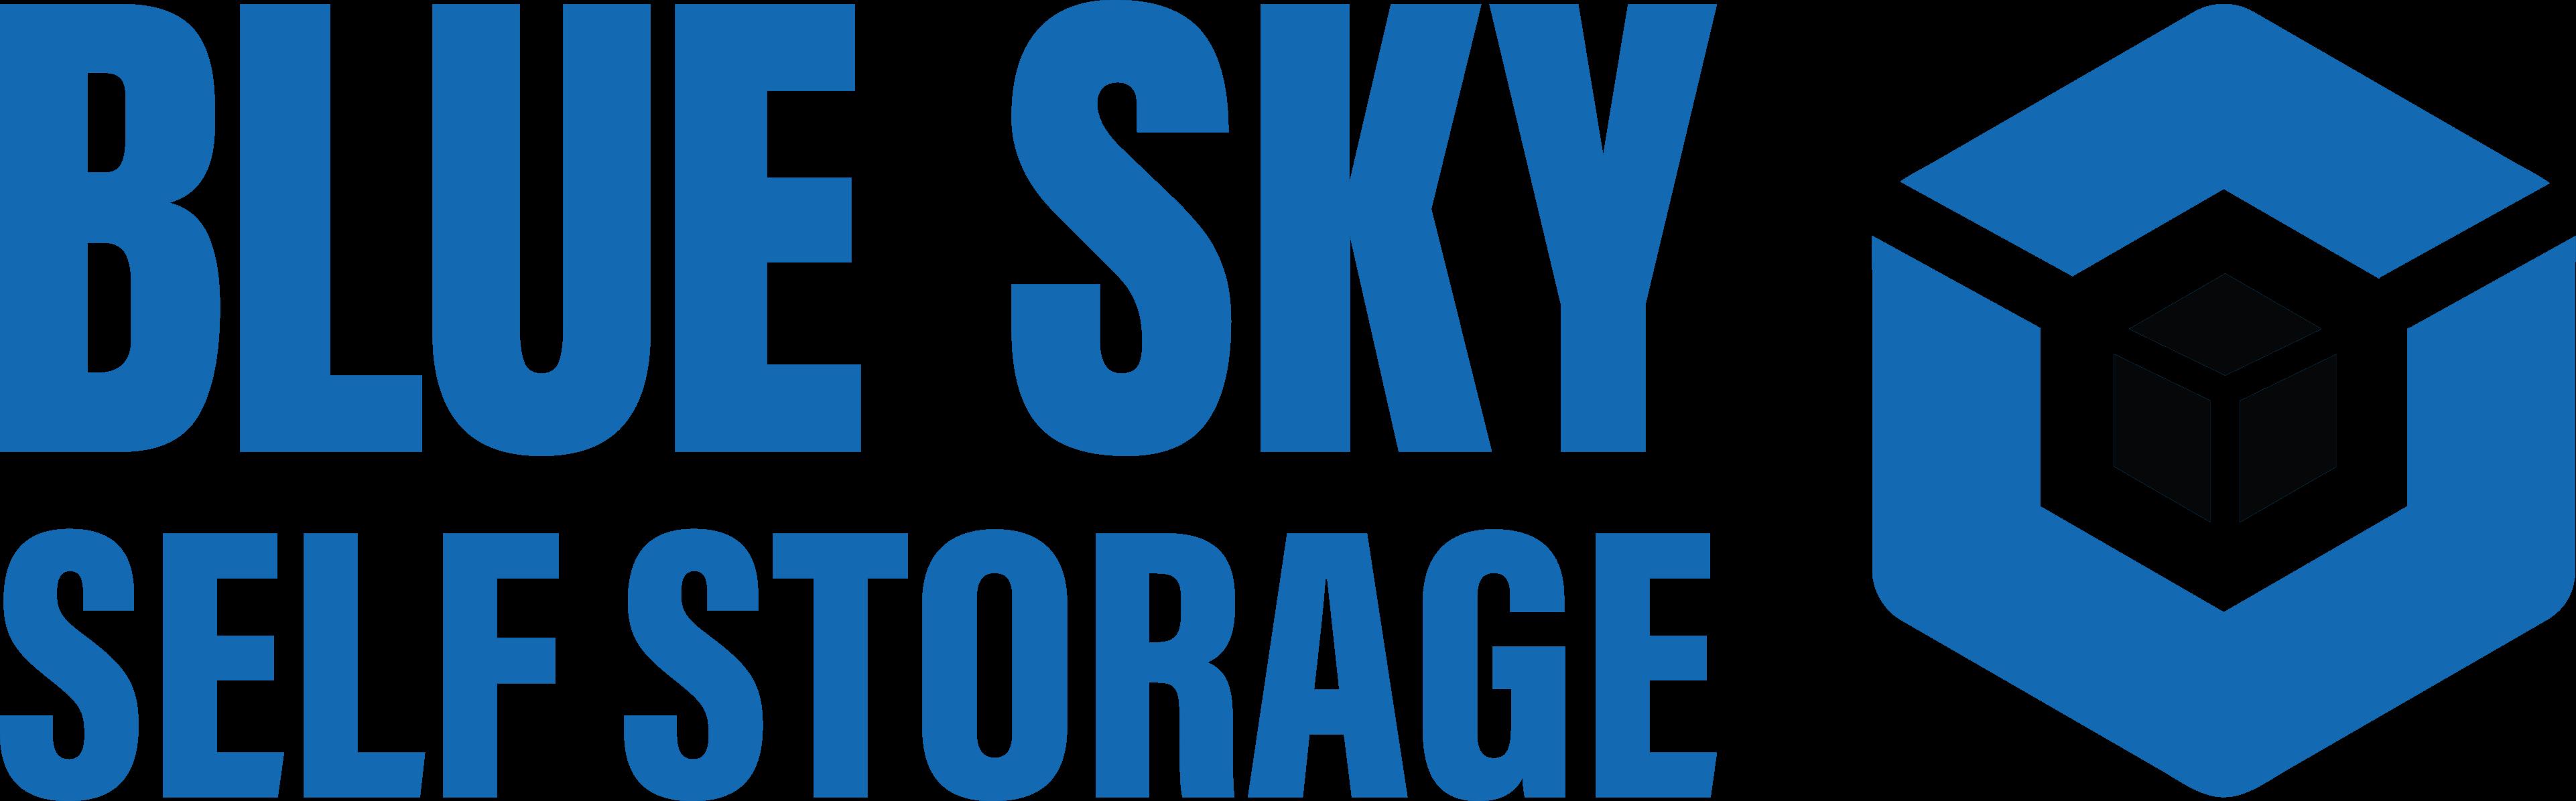 Blue Sky Self Storage - Conroe